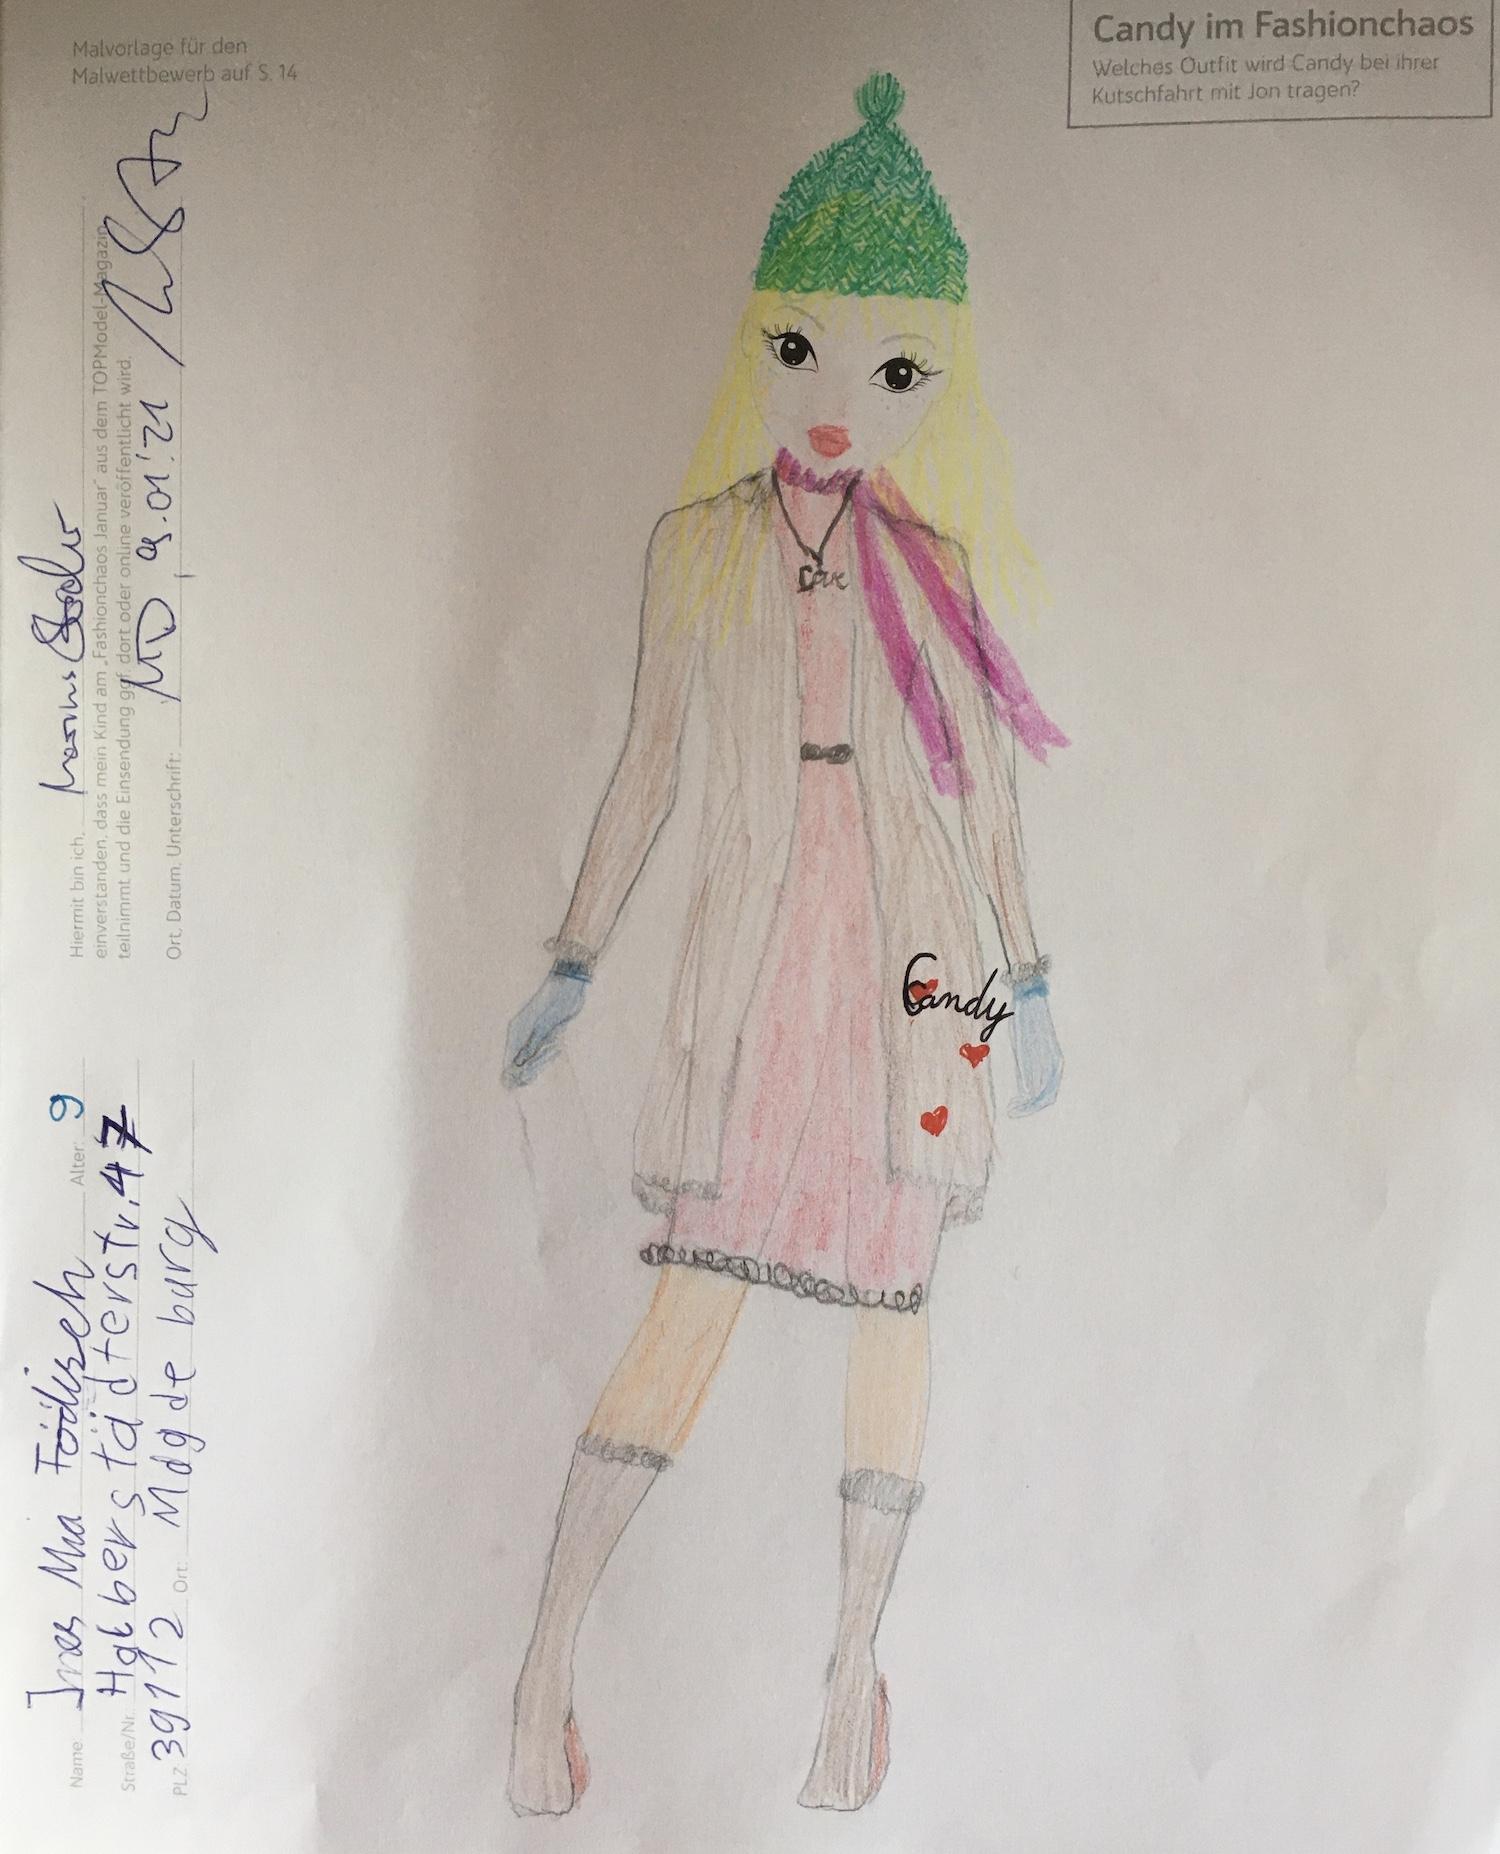 Ines-Mia F., 9 Jahre, aus Magdeburg